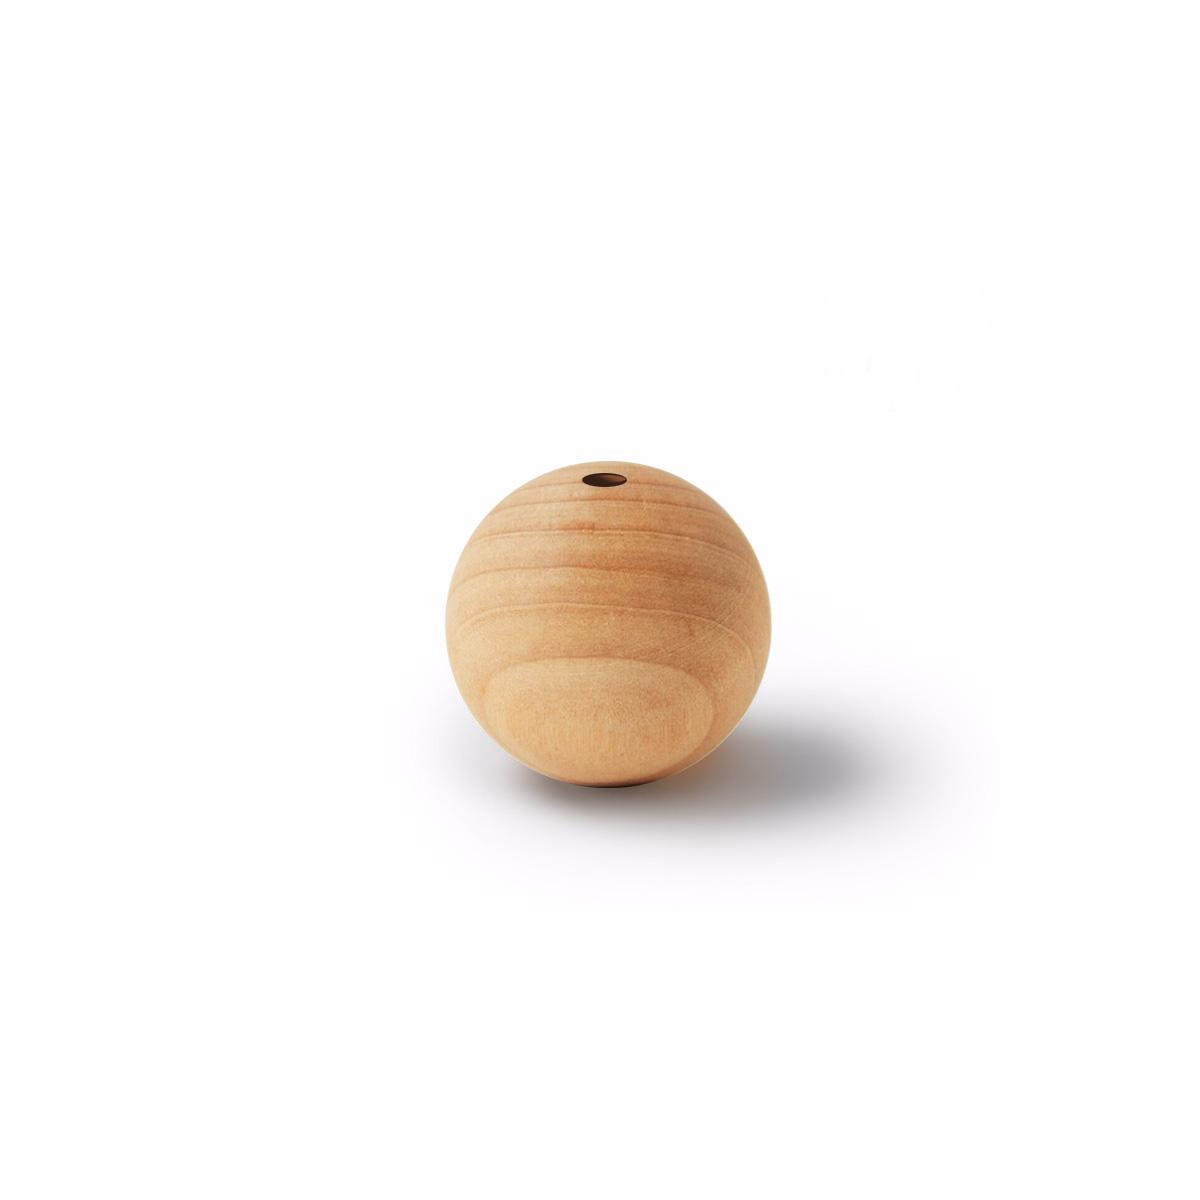 19 mm Diameter Brass United Scientific Supplies PNBB19 Pendulum Drilled Ball